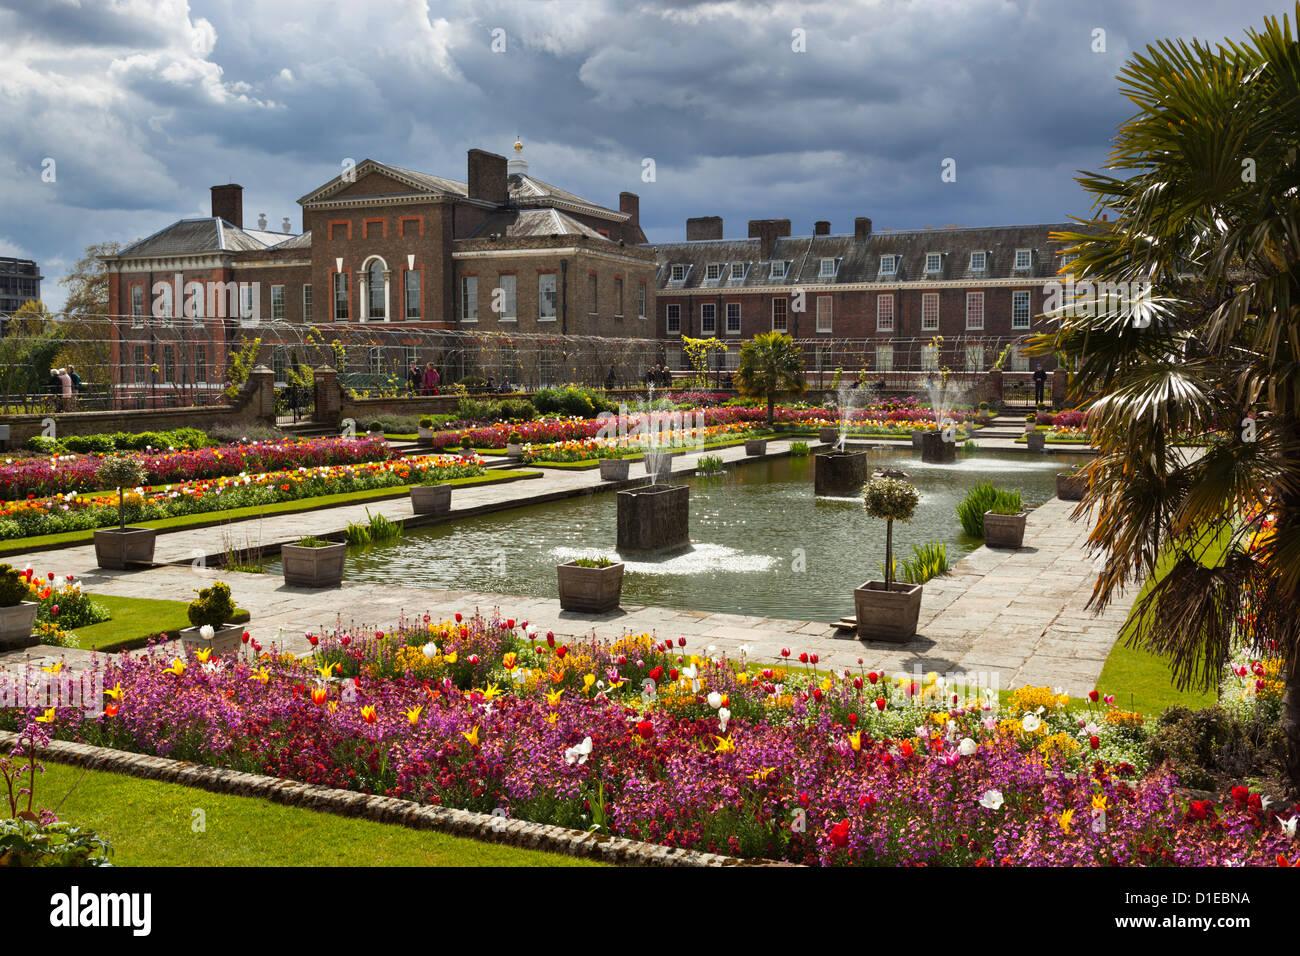 Formal Garden Flowers England Stock Photos & Formal Garden Flowers ...